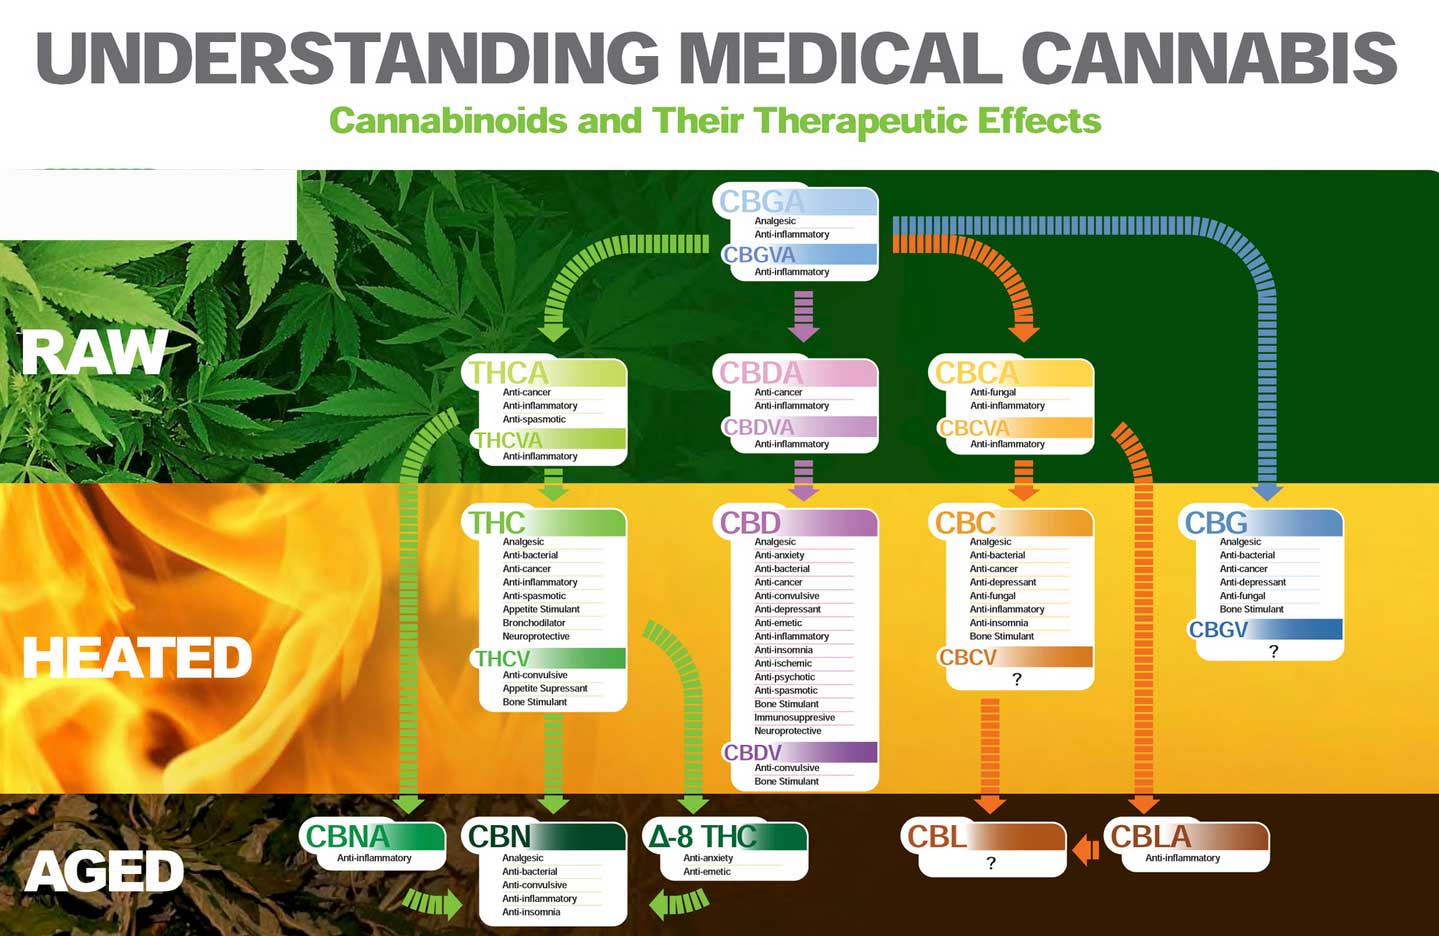 Cannabinoide in der Medizin